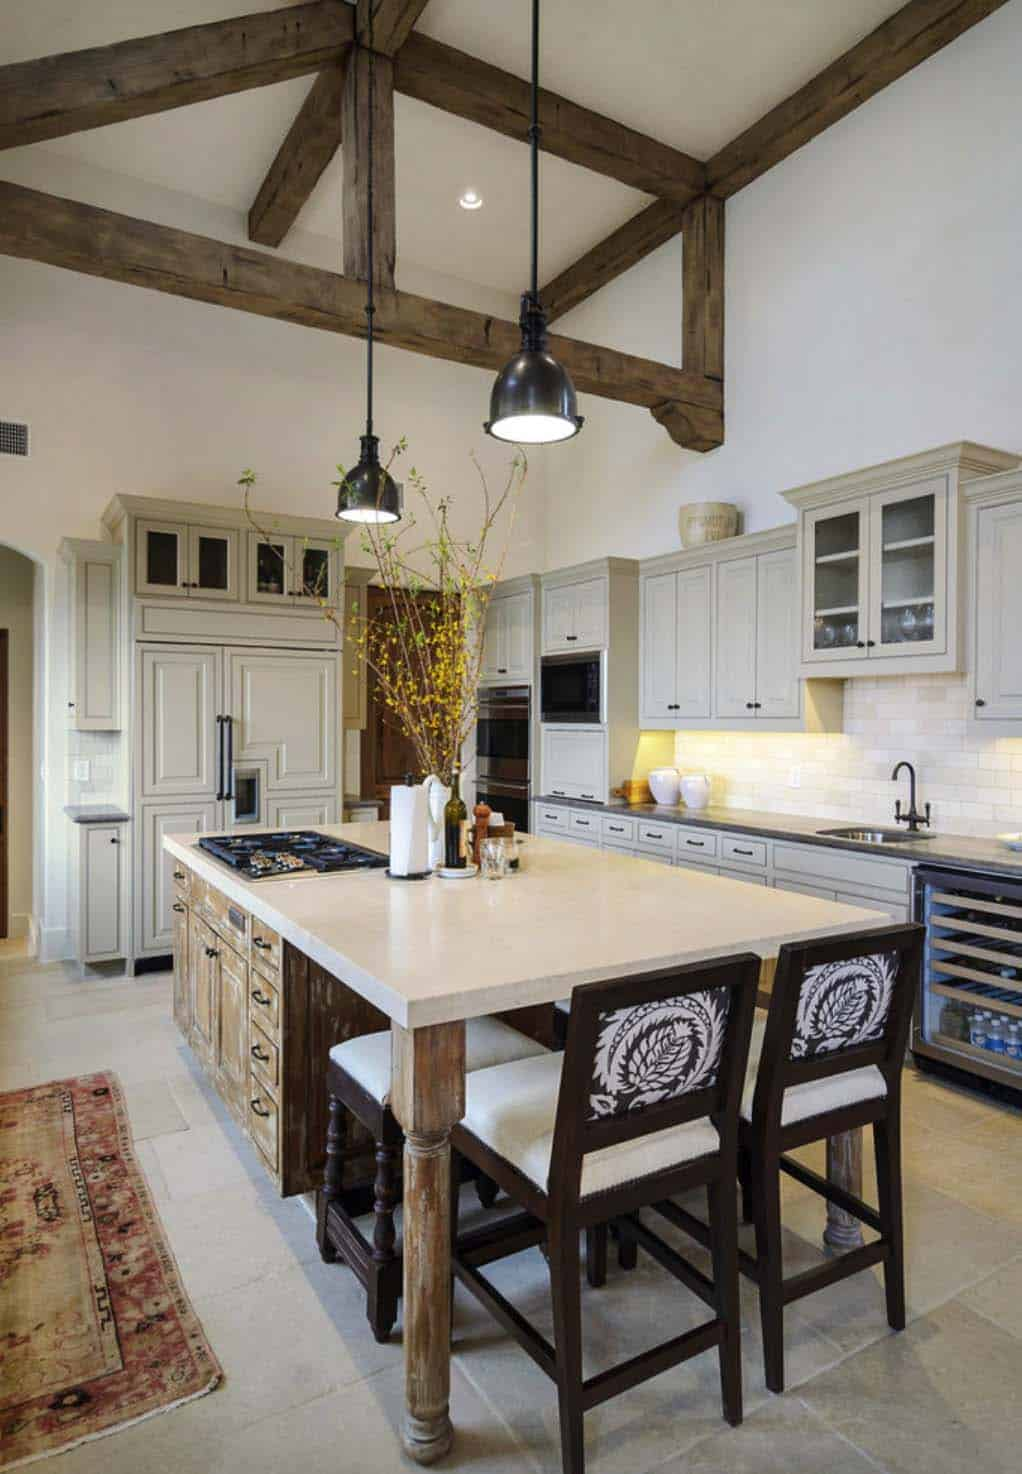 Rustic Mediterranean Style Home Design-08-1 Kindesign